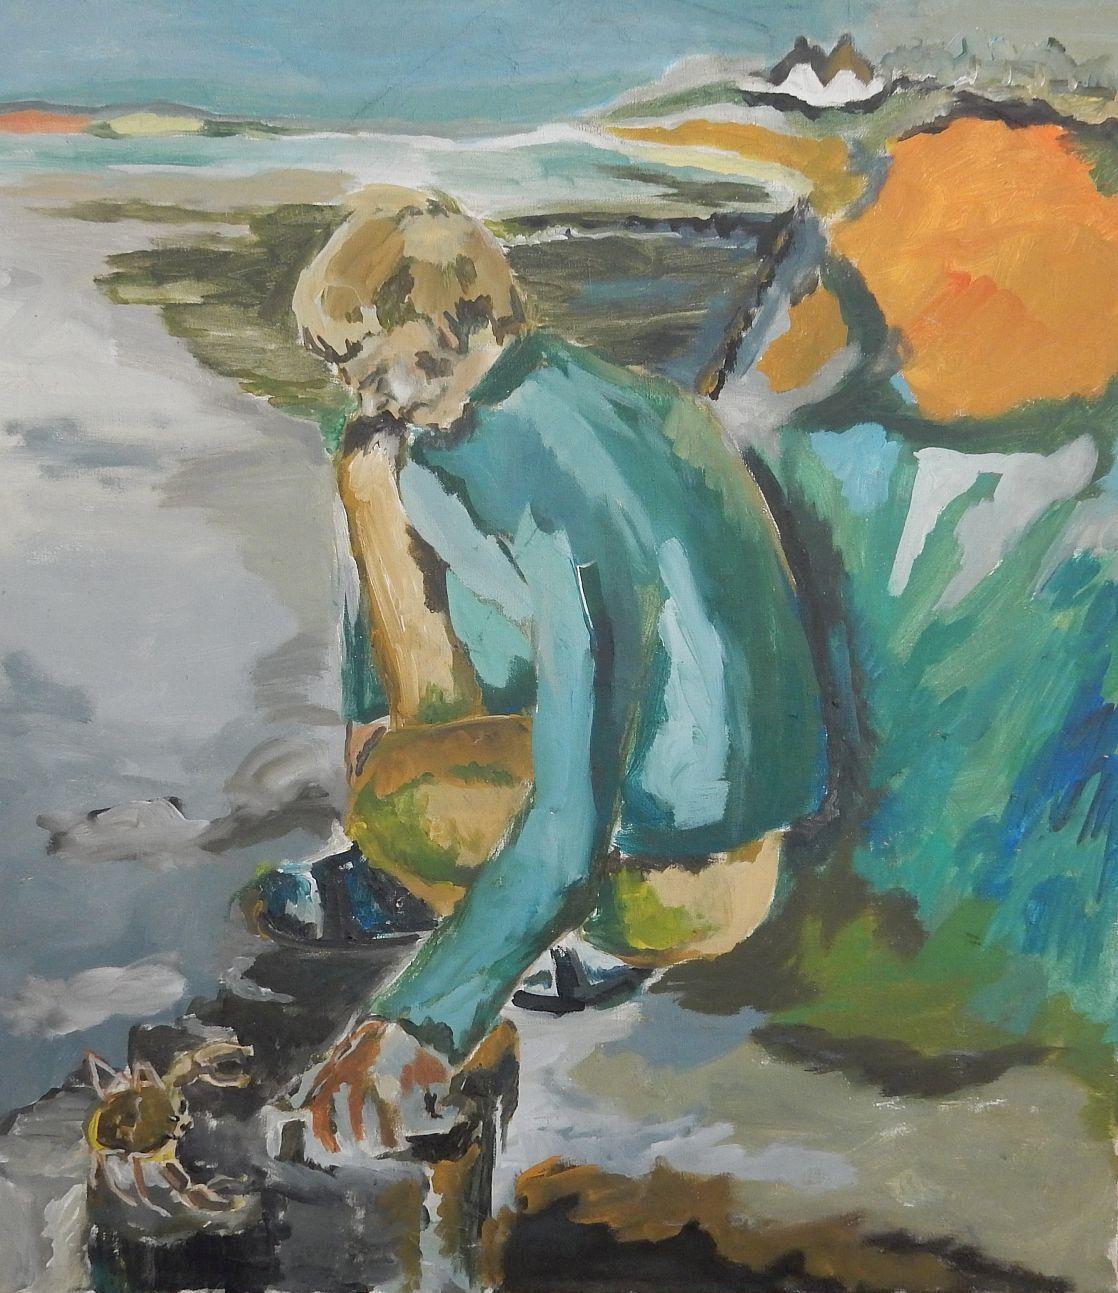 Anatol Herzfeld - Manni Becker als Krebsfänger, Ölgemälde, 90,5x80,5 cm, verso signiert 1966 kopen? Bied vanaf 790!